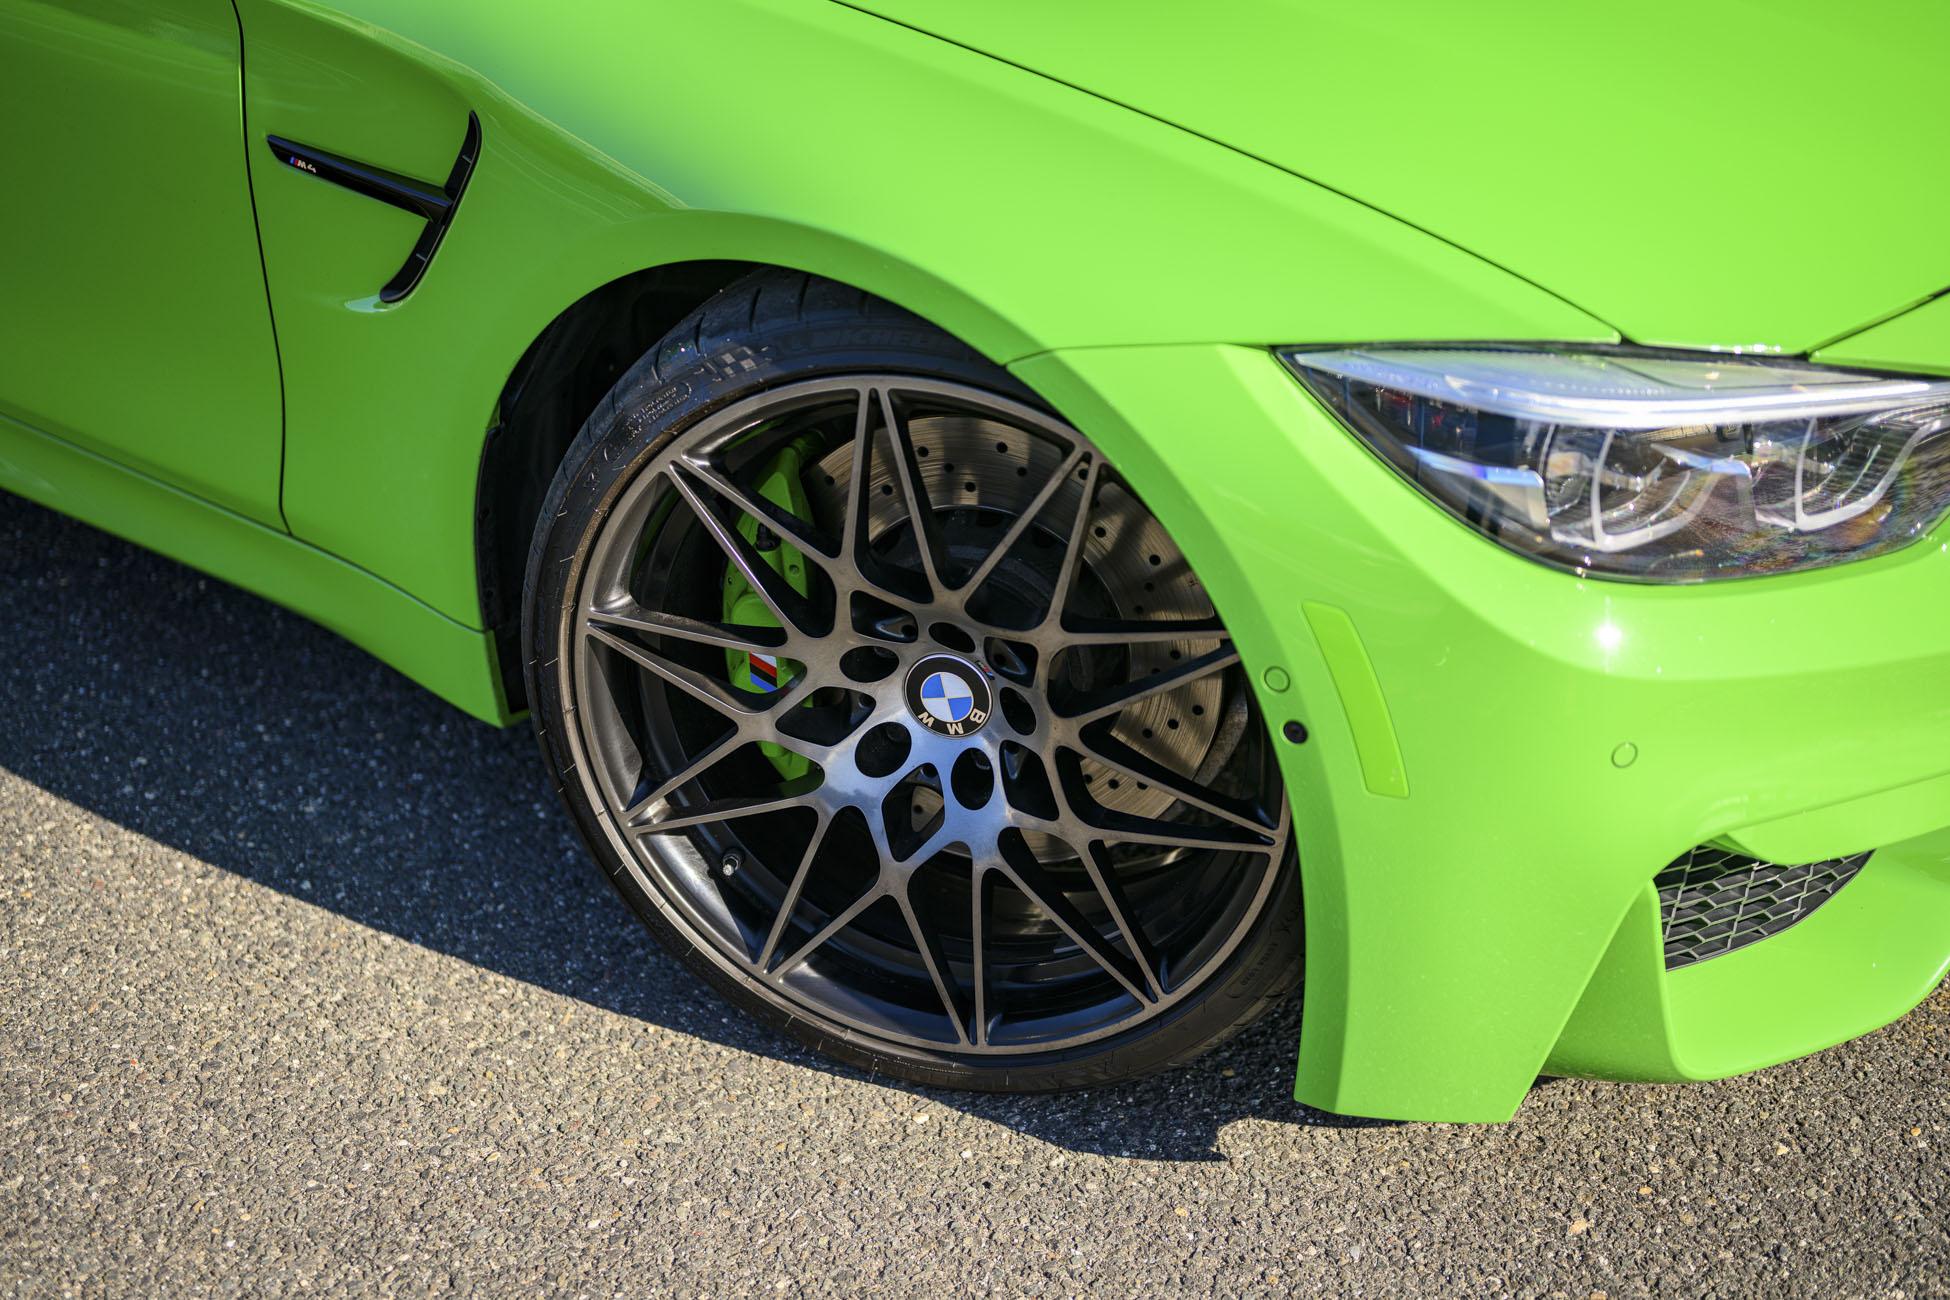 BMW style 666 wheel